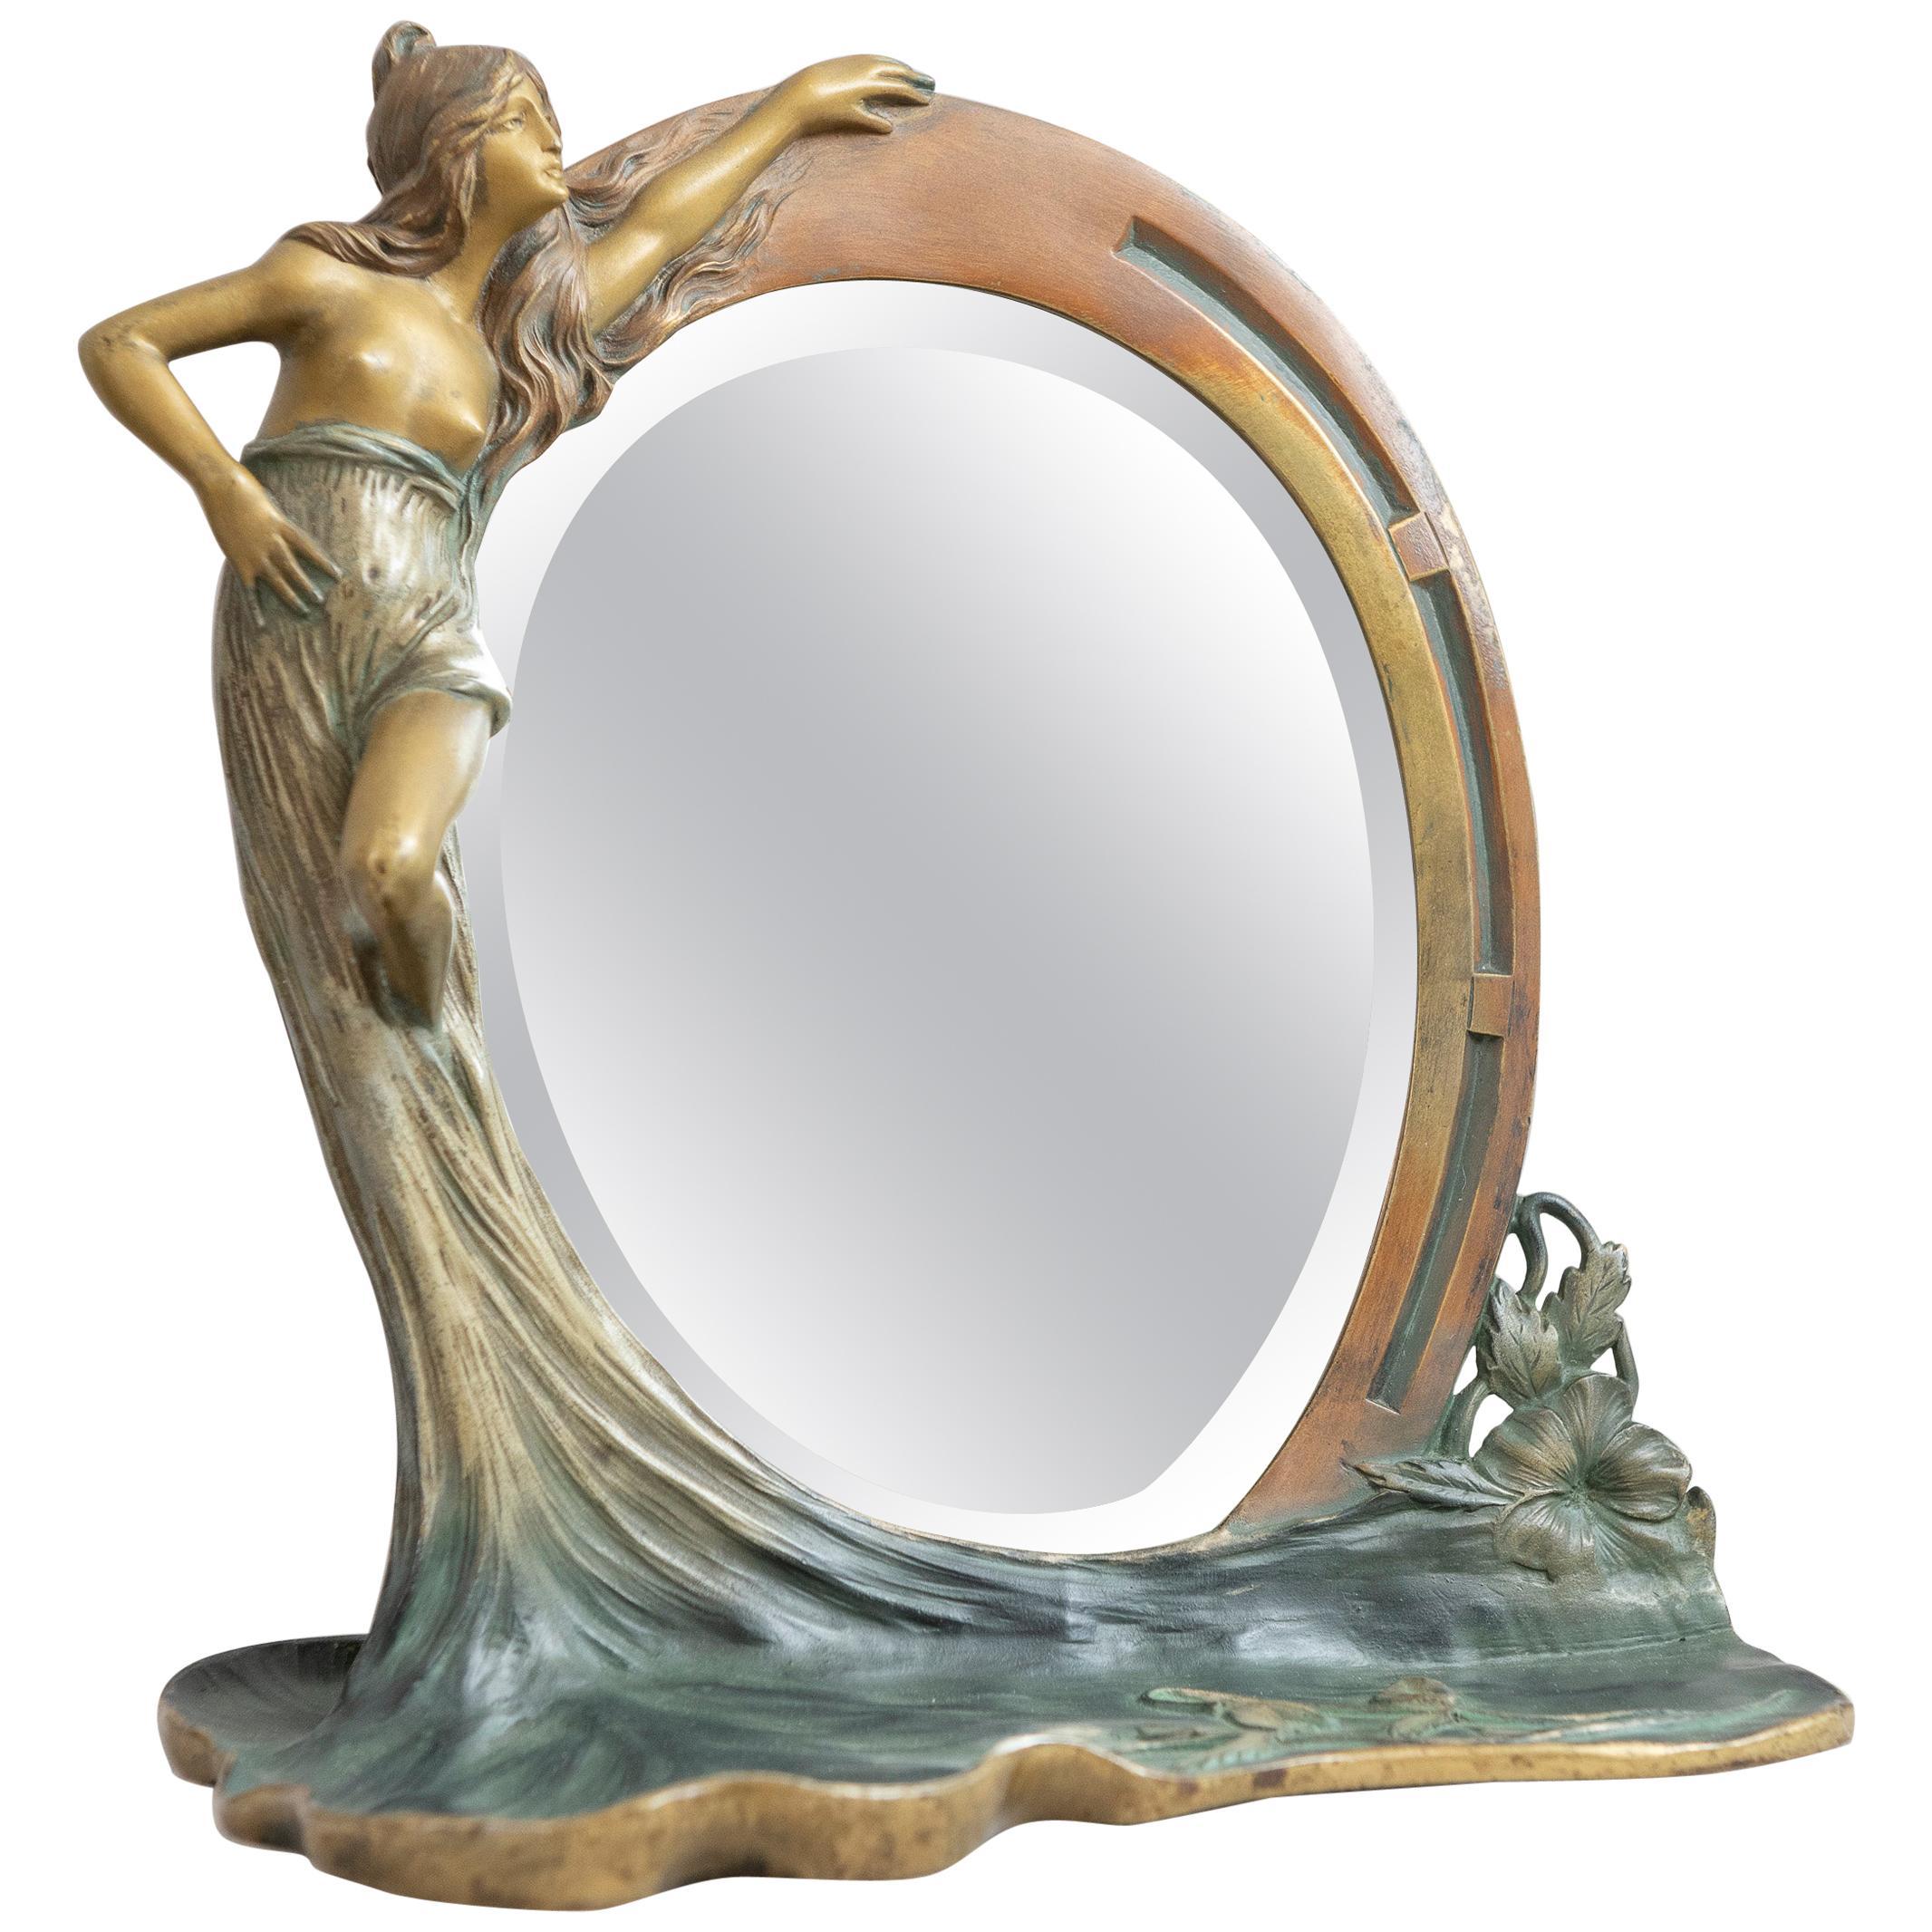 Antique French Art Nouveau Mirror w/ Maiden, ca.1900